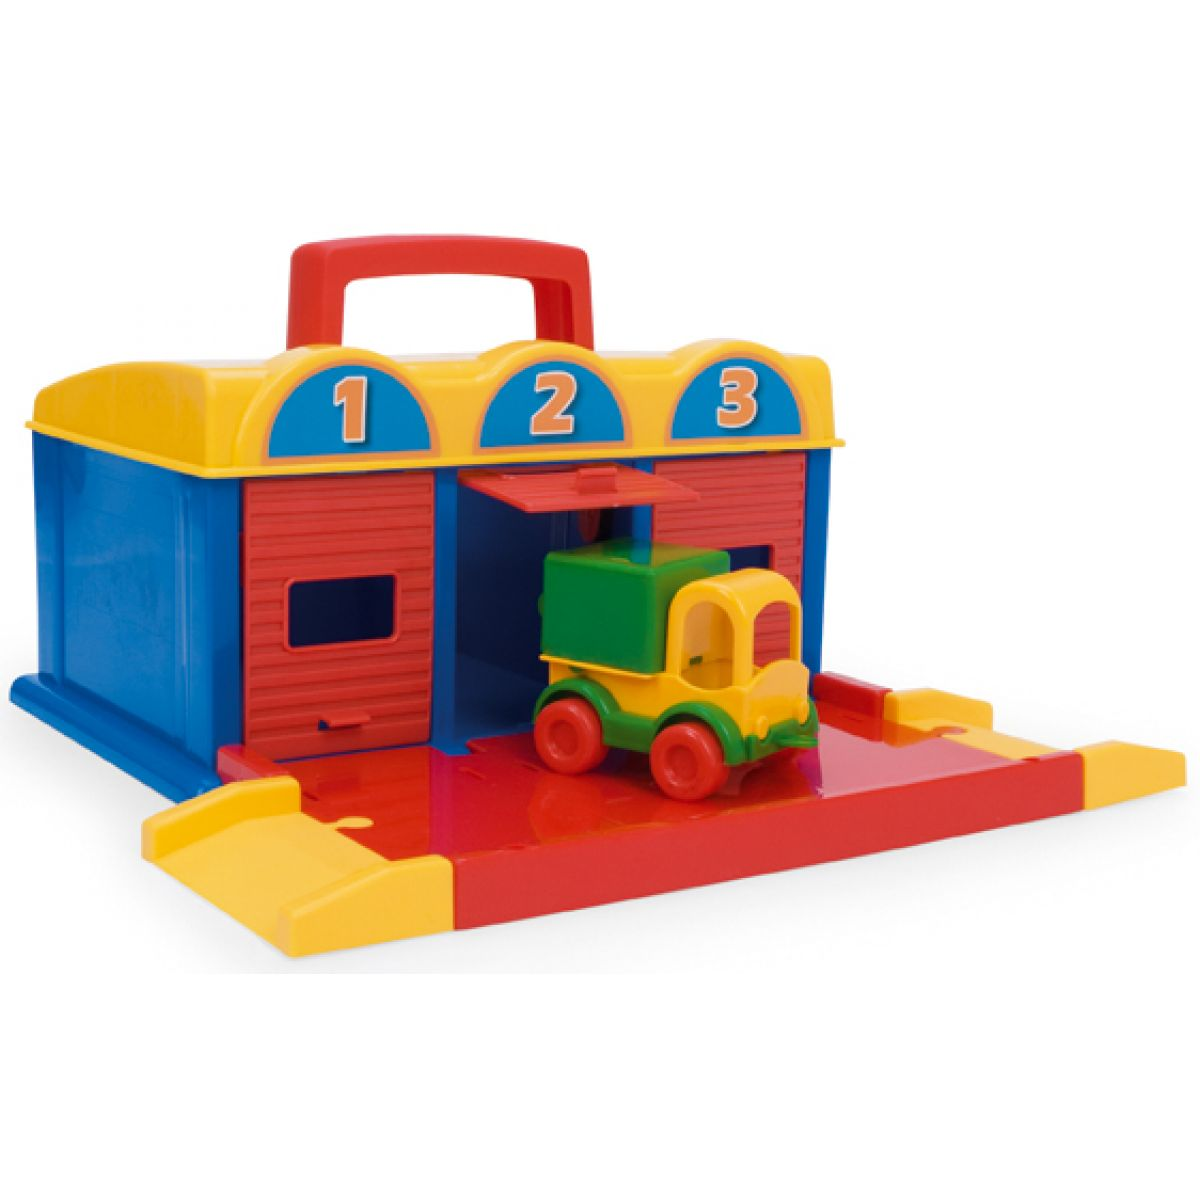 Garáž kid car 3 boxy Wader 50950